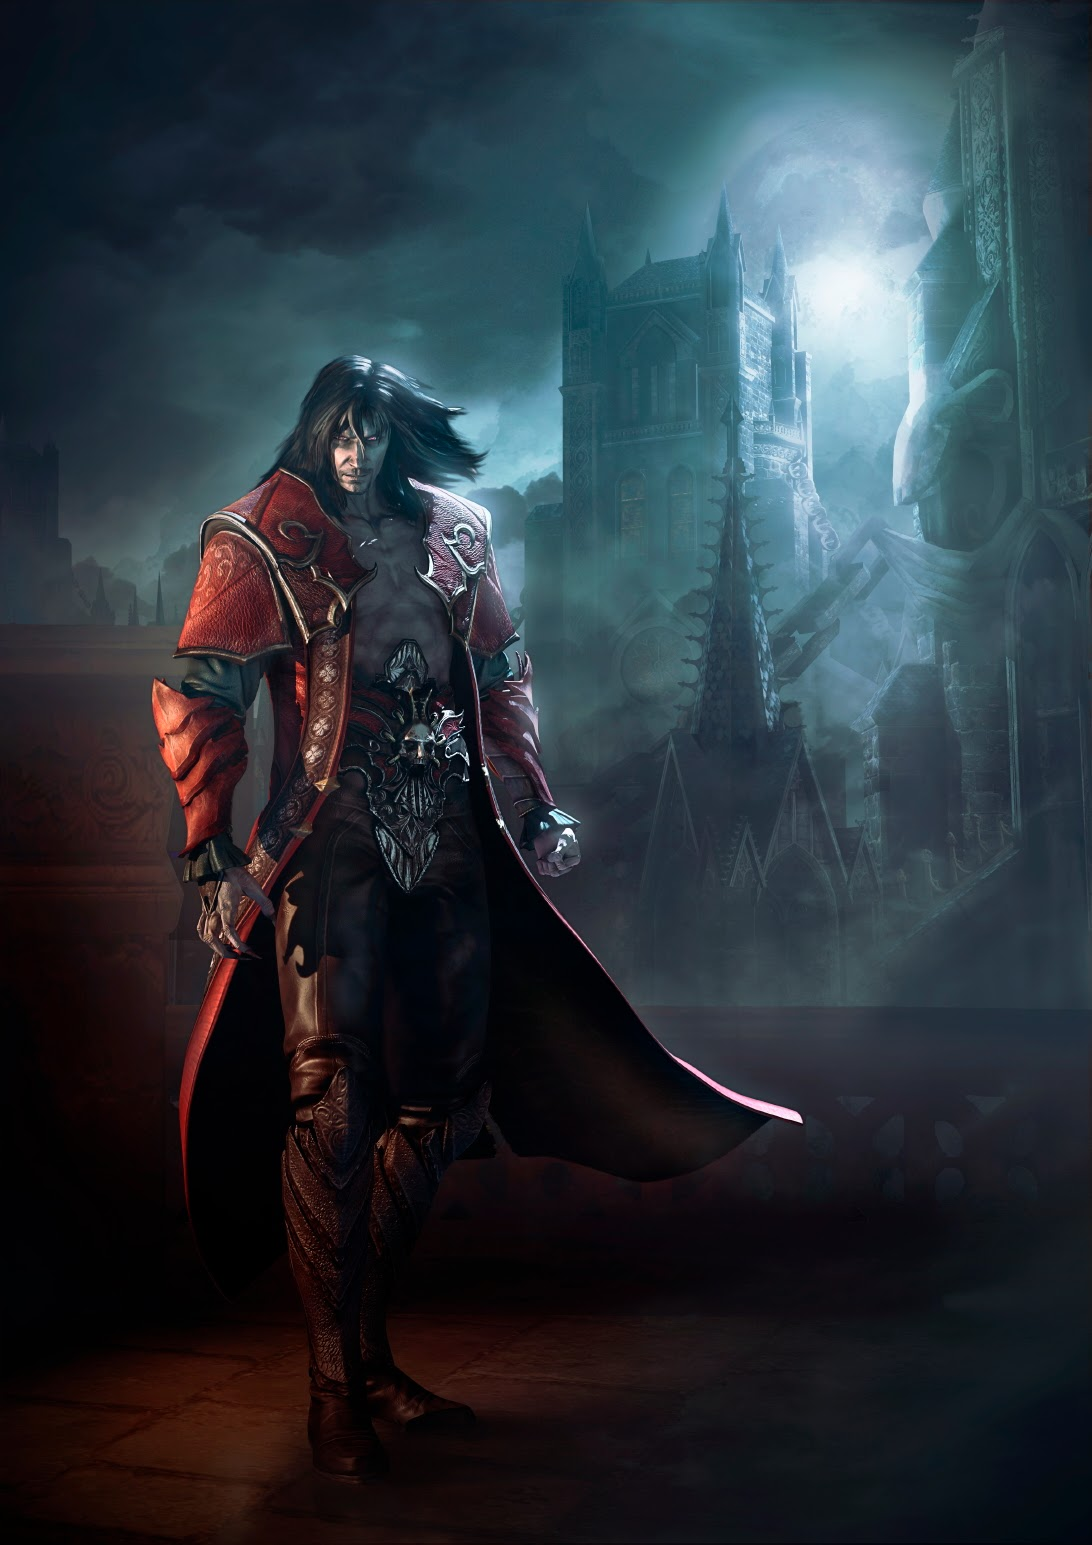 http://game-saga.com/wp-content/uploads/2018/12/castlevania-lords-of-shadow-2-artwork-3.jpg